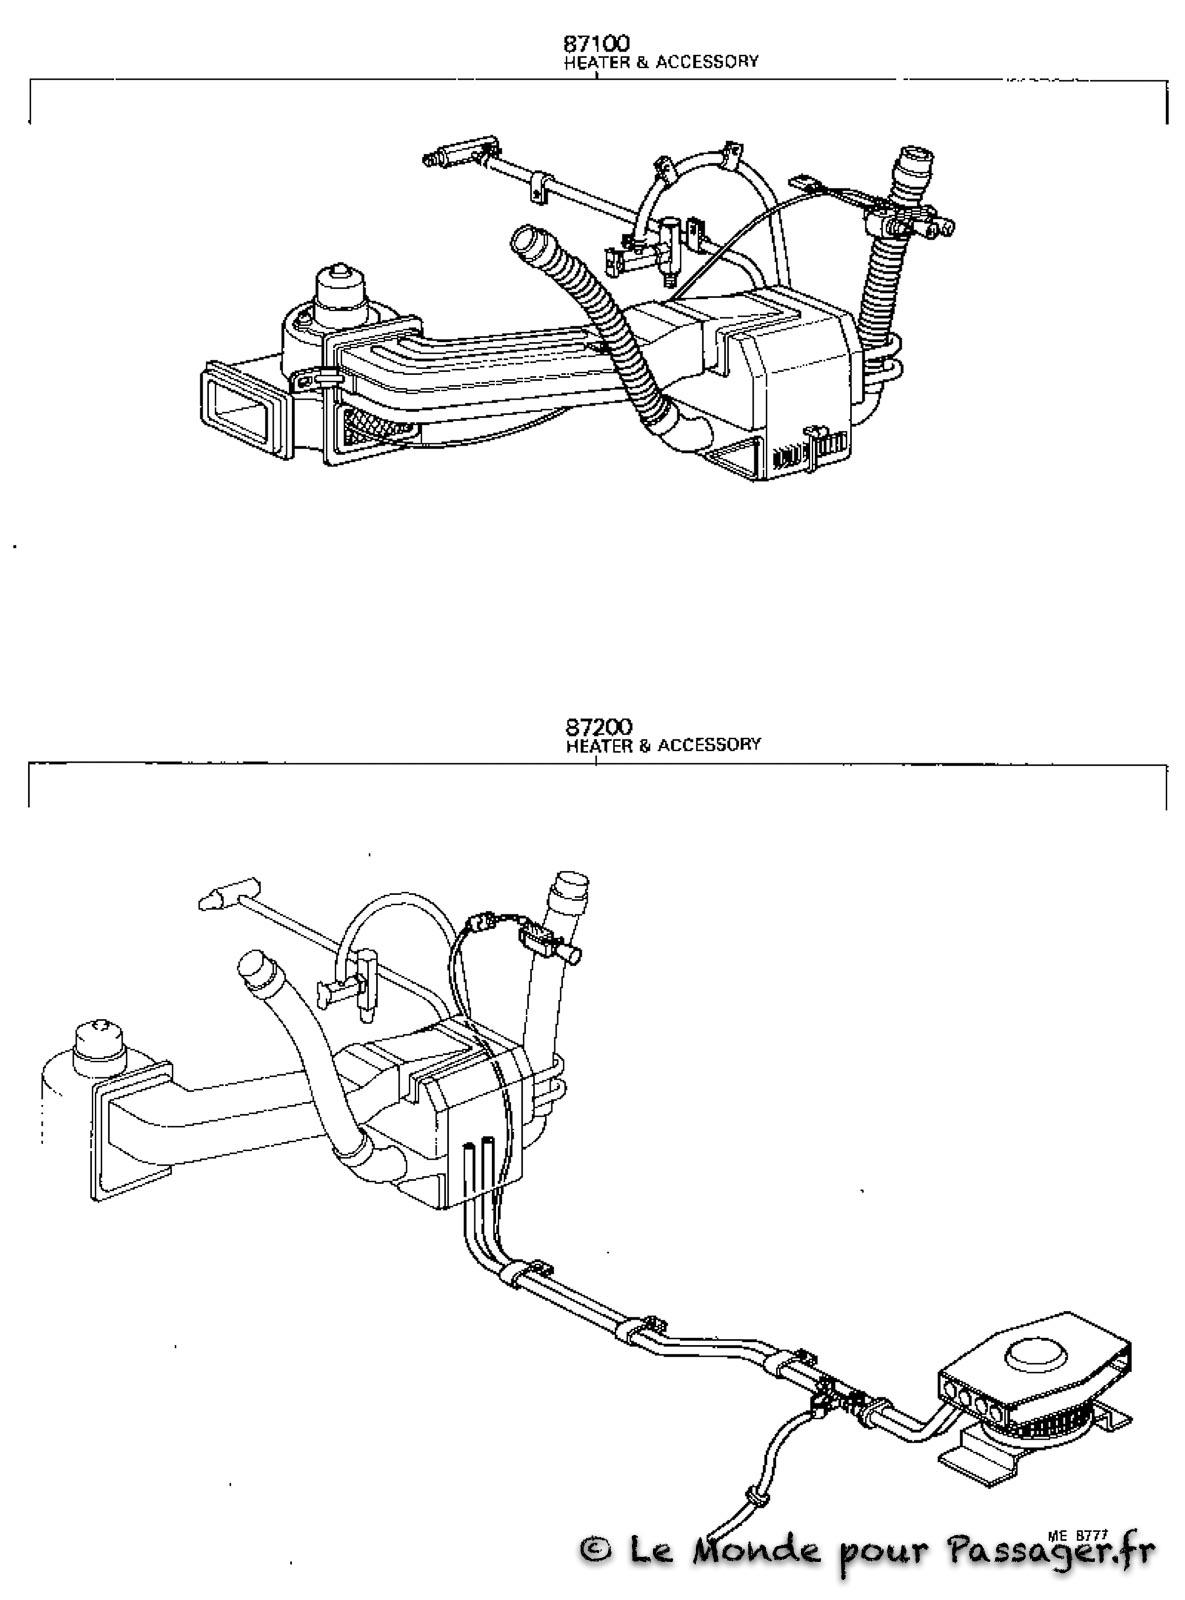 Fj55-Eclatés-Techniques057